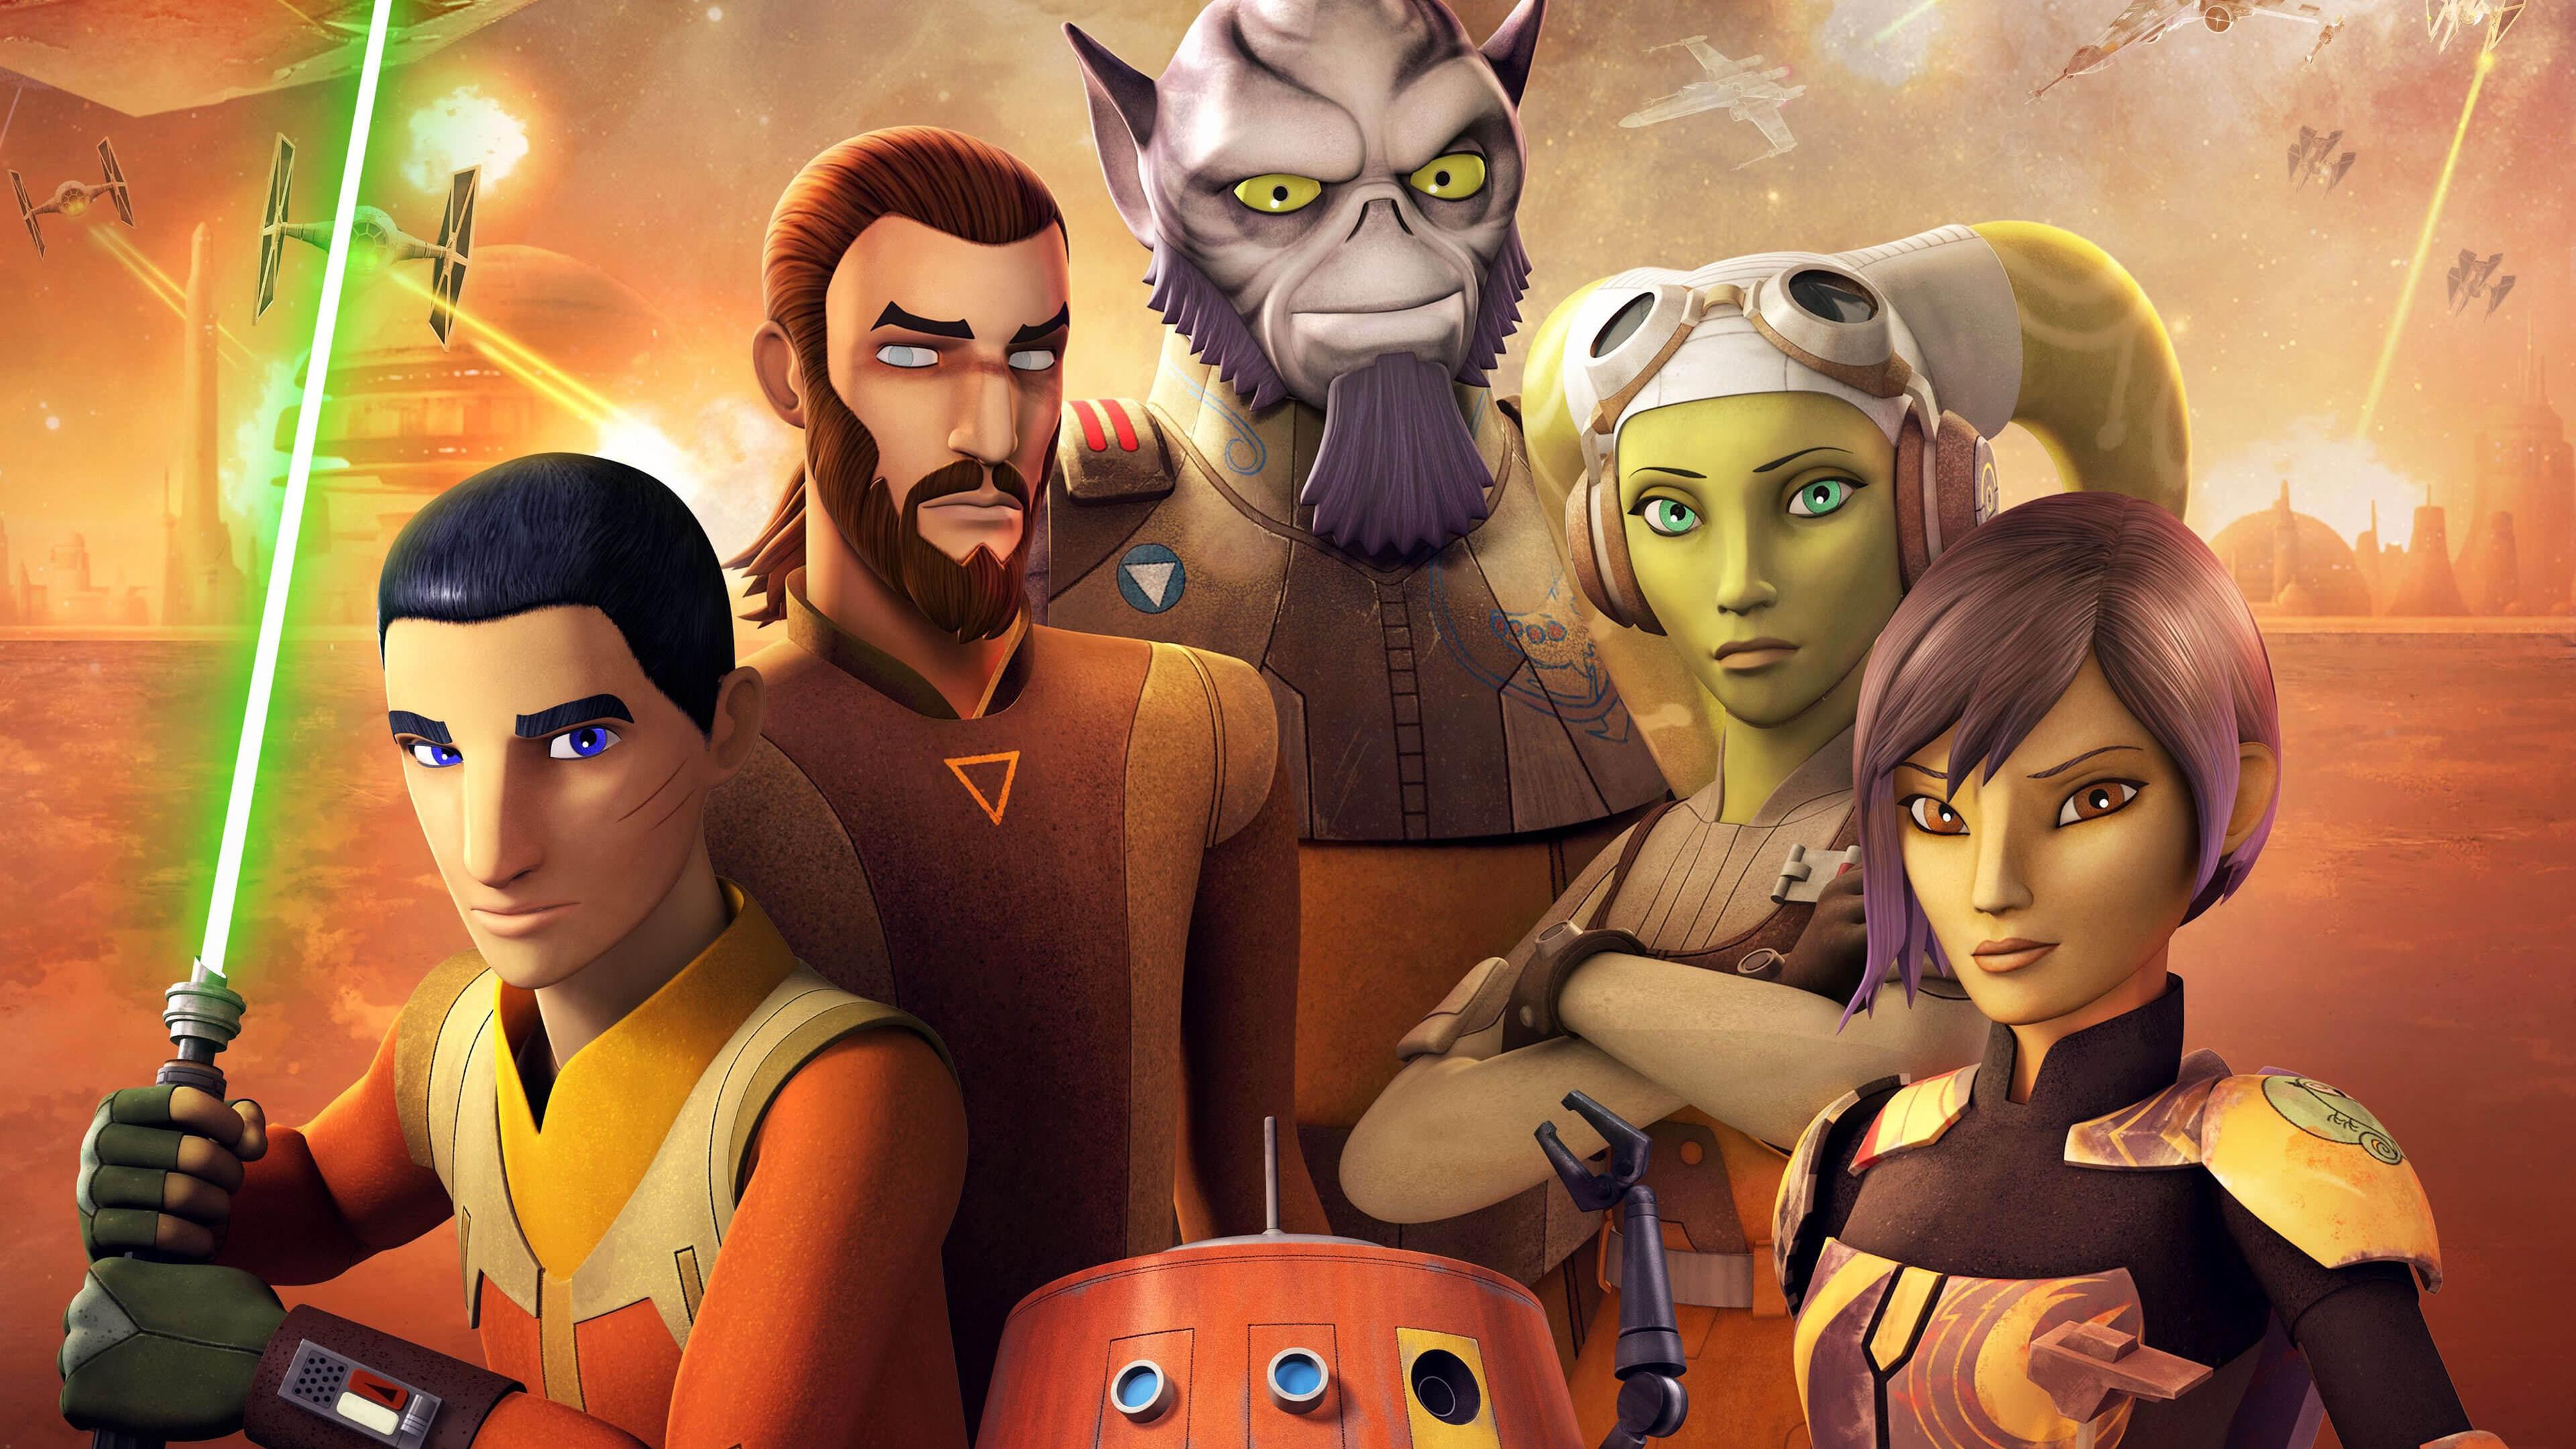 star wars rebels characters uhd 4k wallpaper